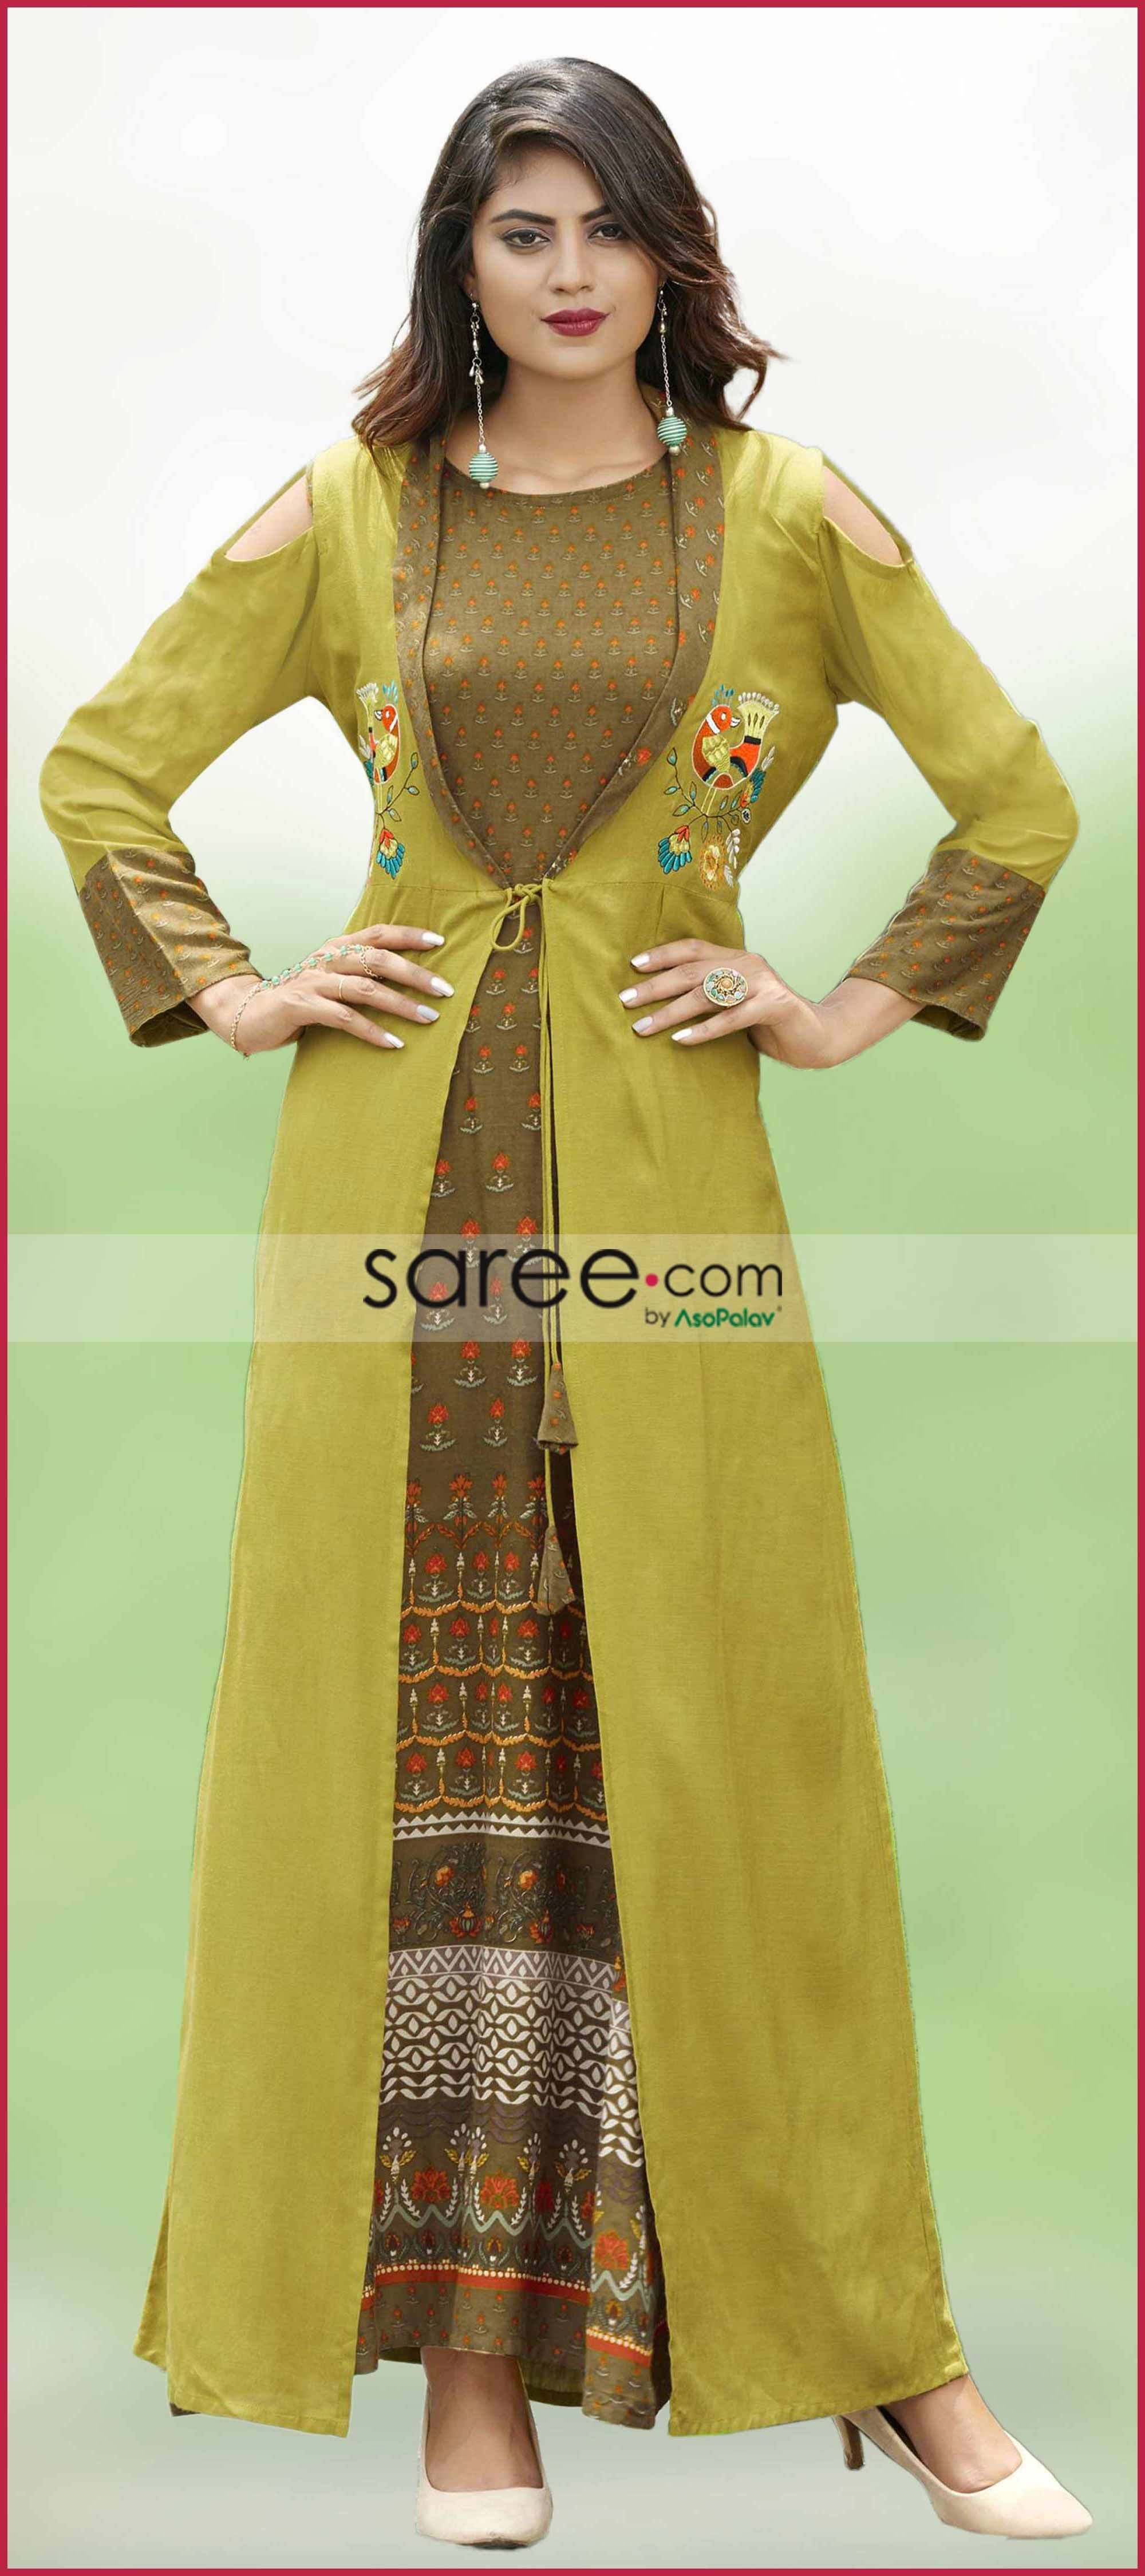 Olive green rayon printed kurti with long jacket fashion